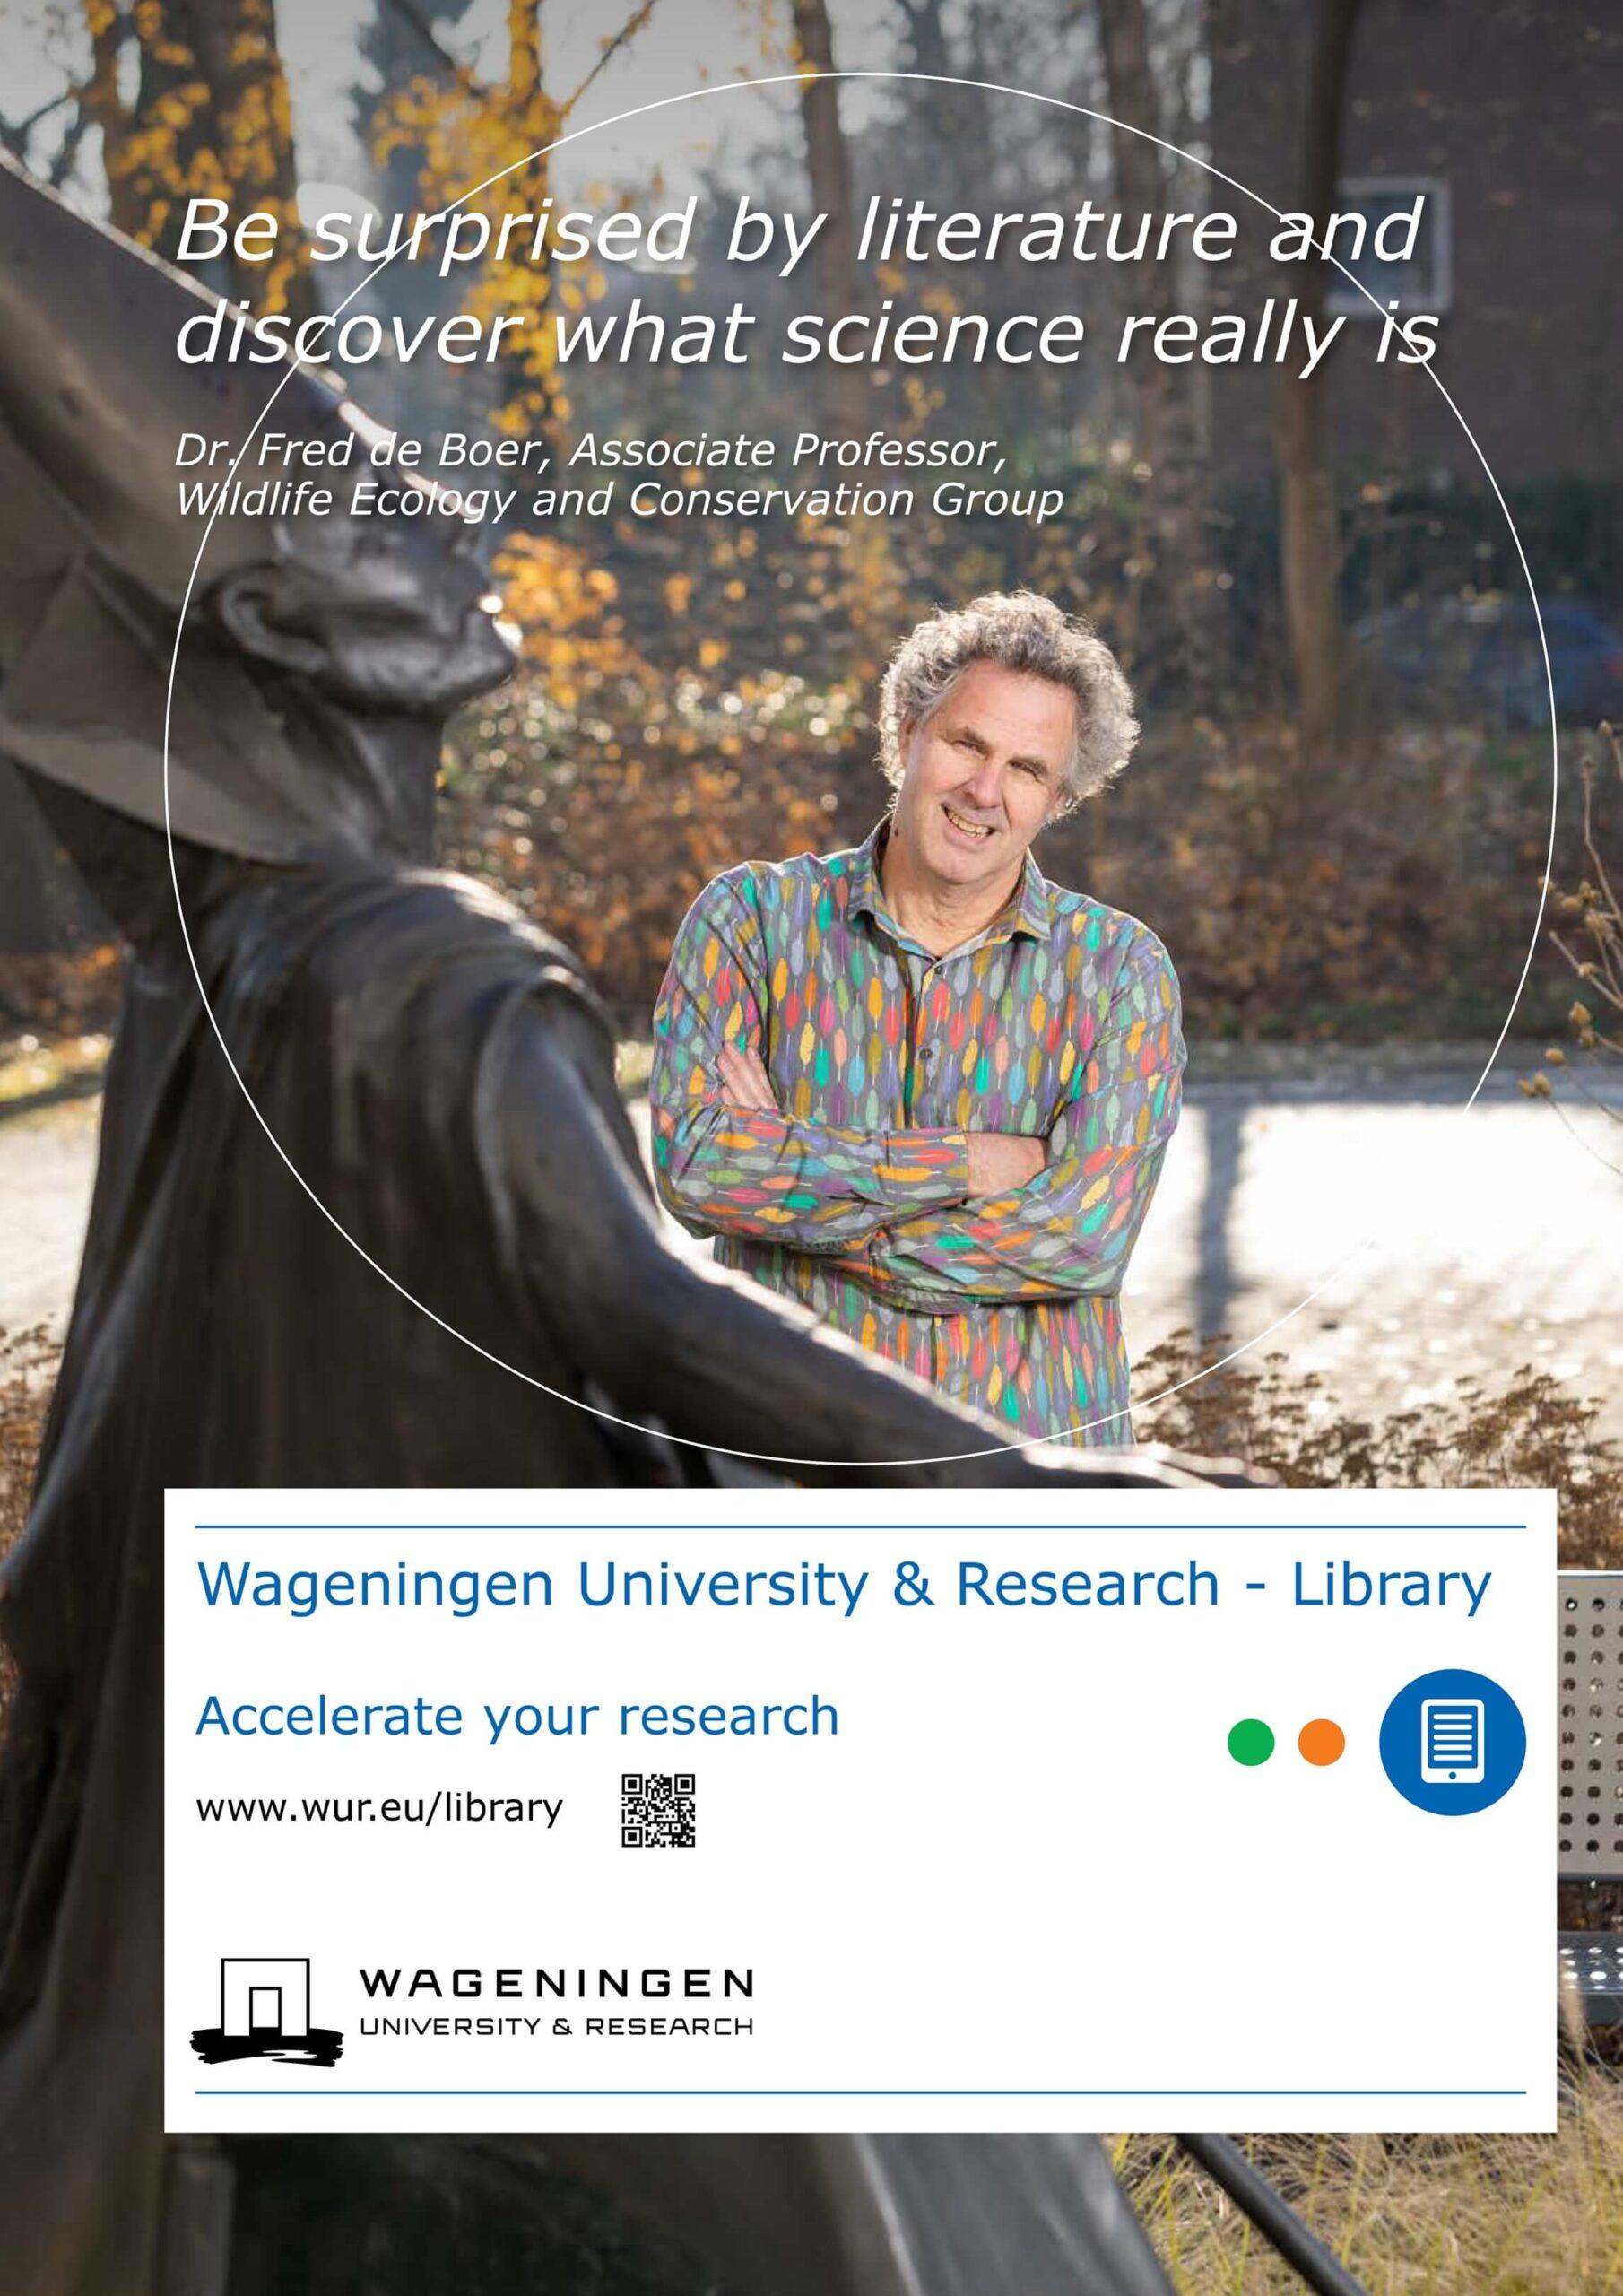 portret professor Poeles Fotografie campagne beelden Wageningen University & Research Library locatie universiteit bibliotheek testimonial WUR